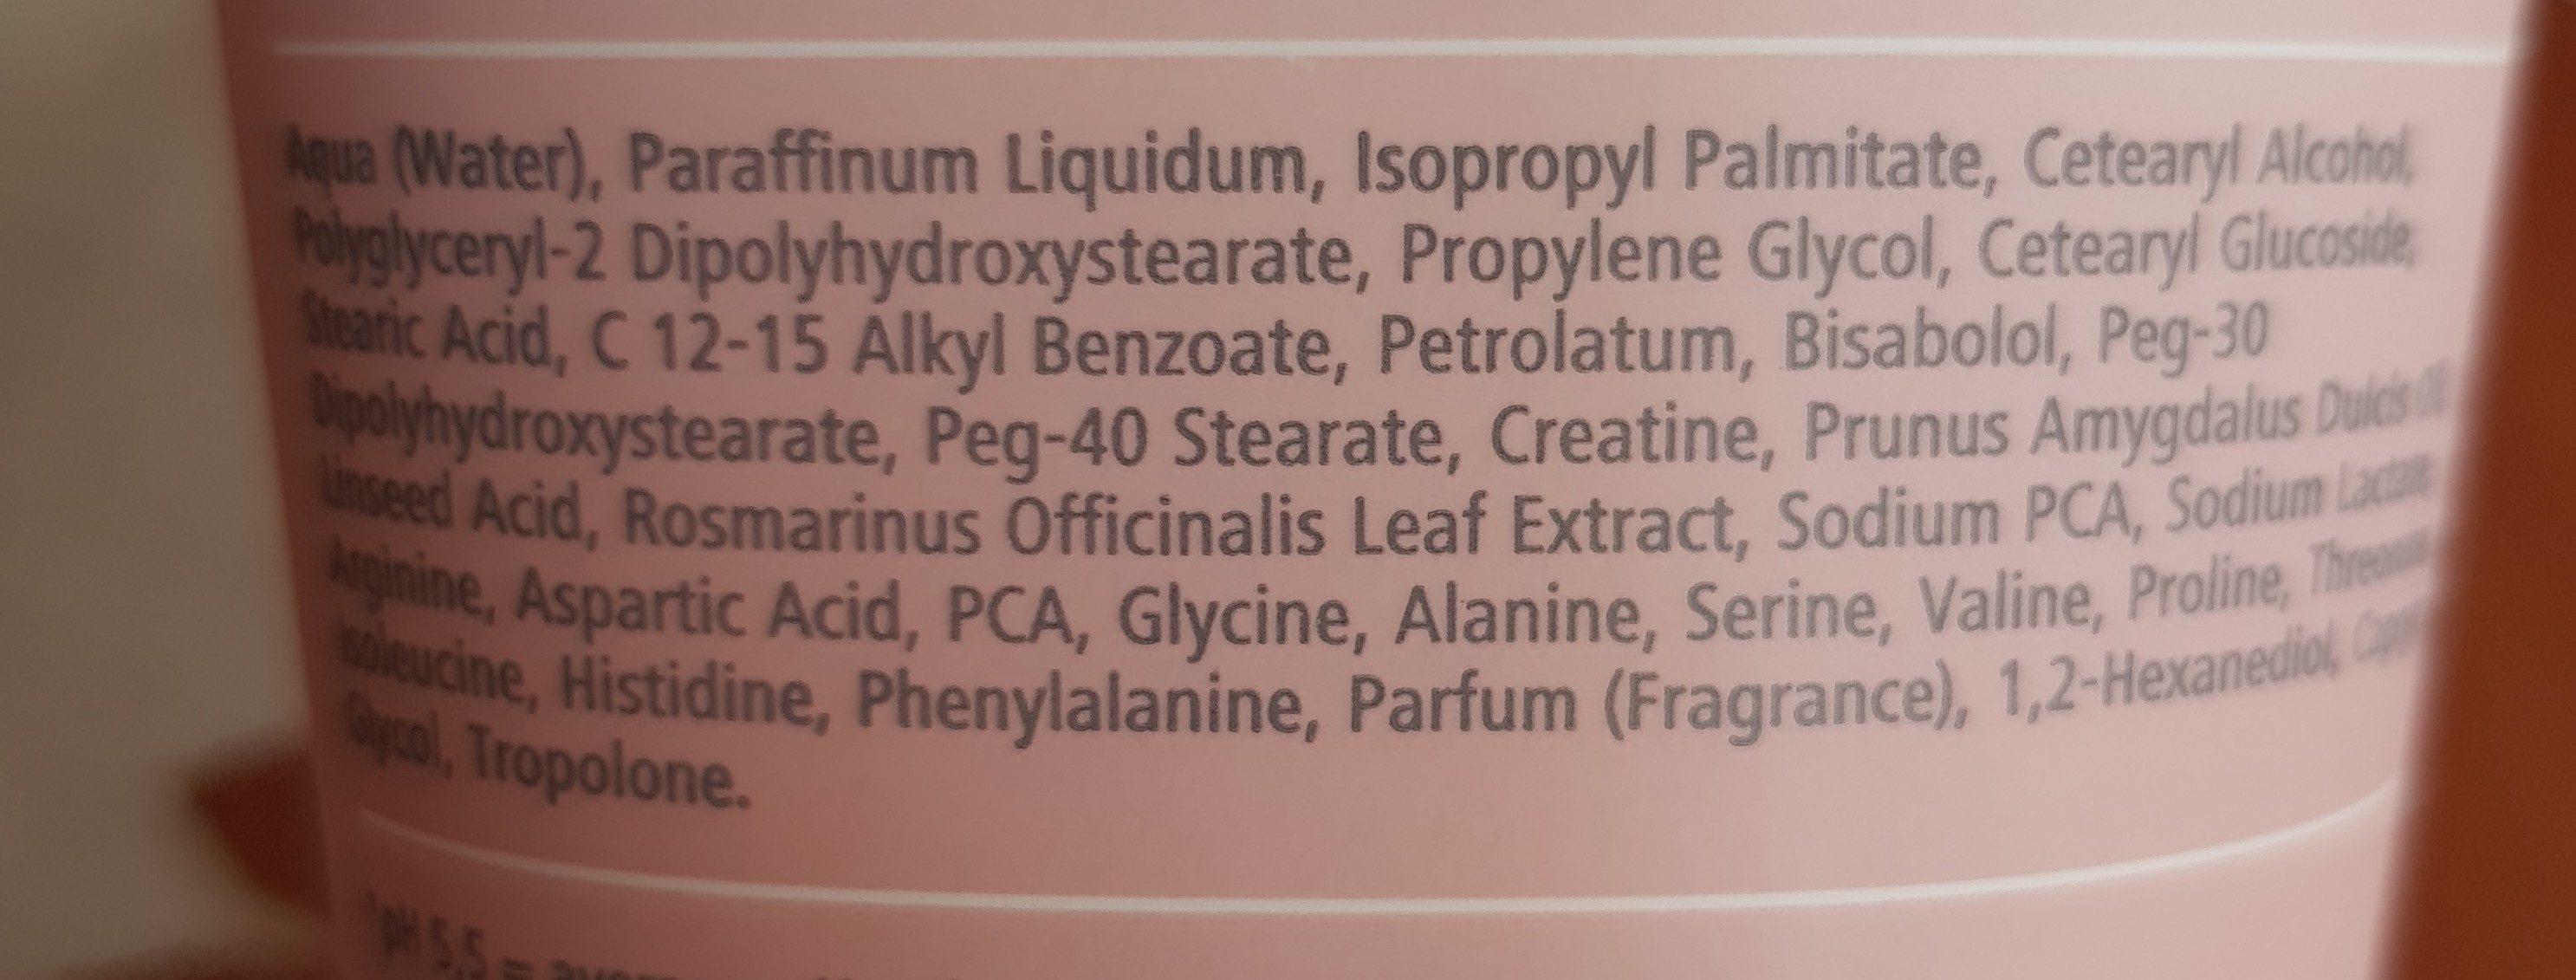 Molicare - Ingrédients